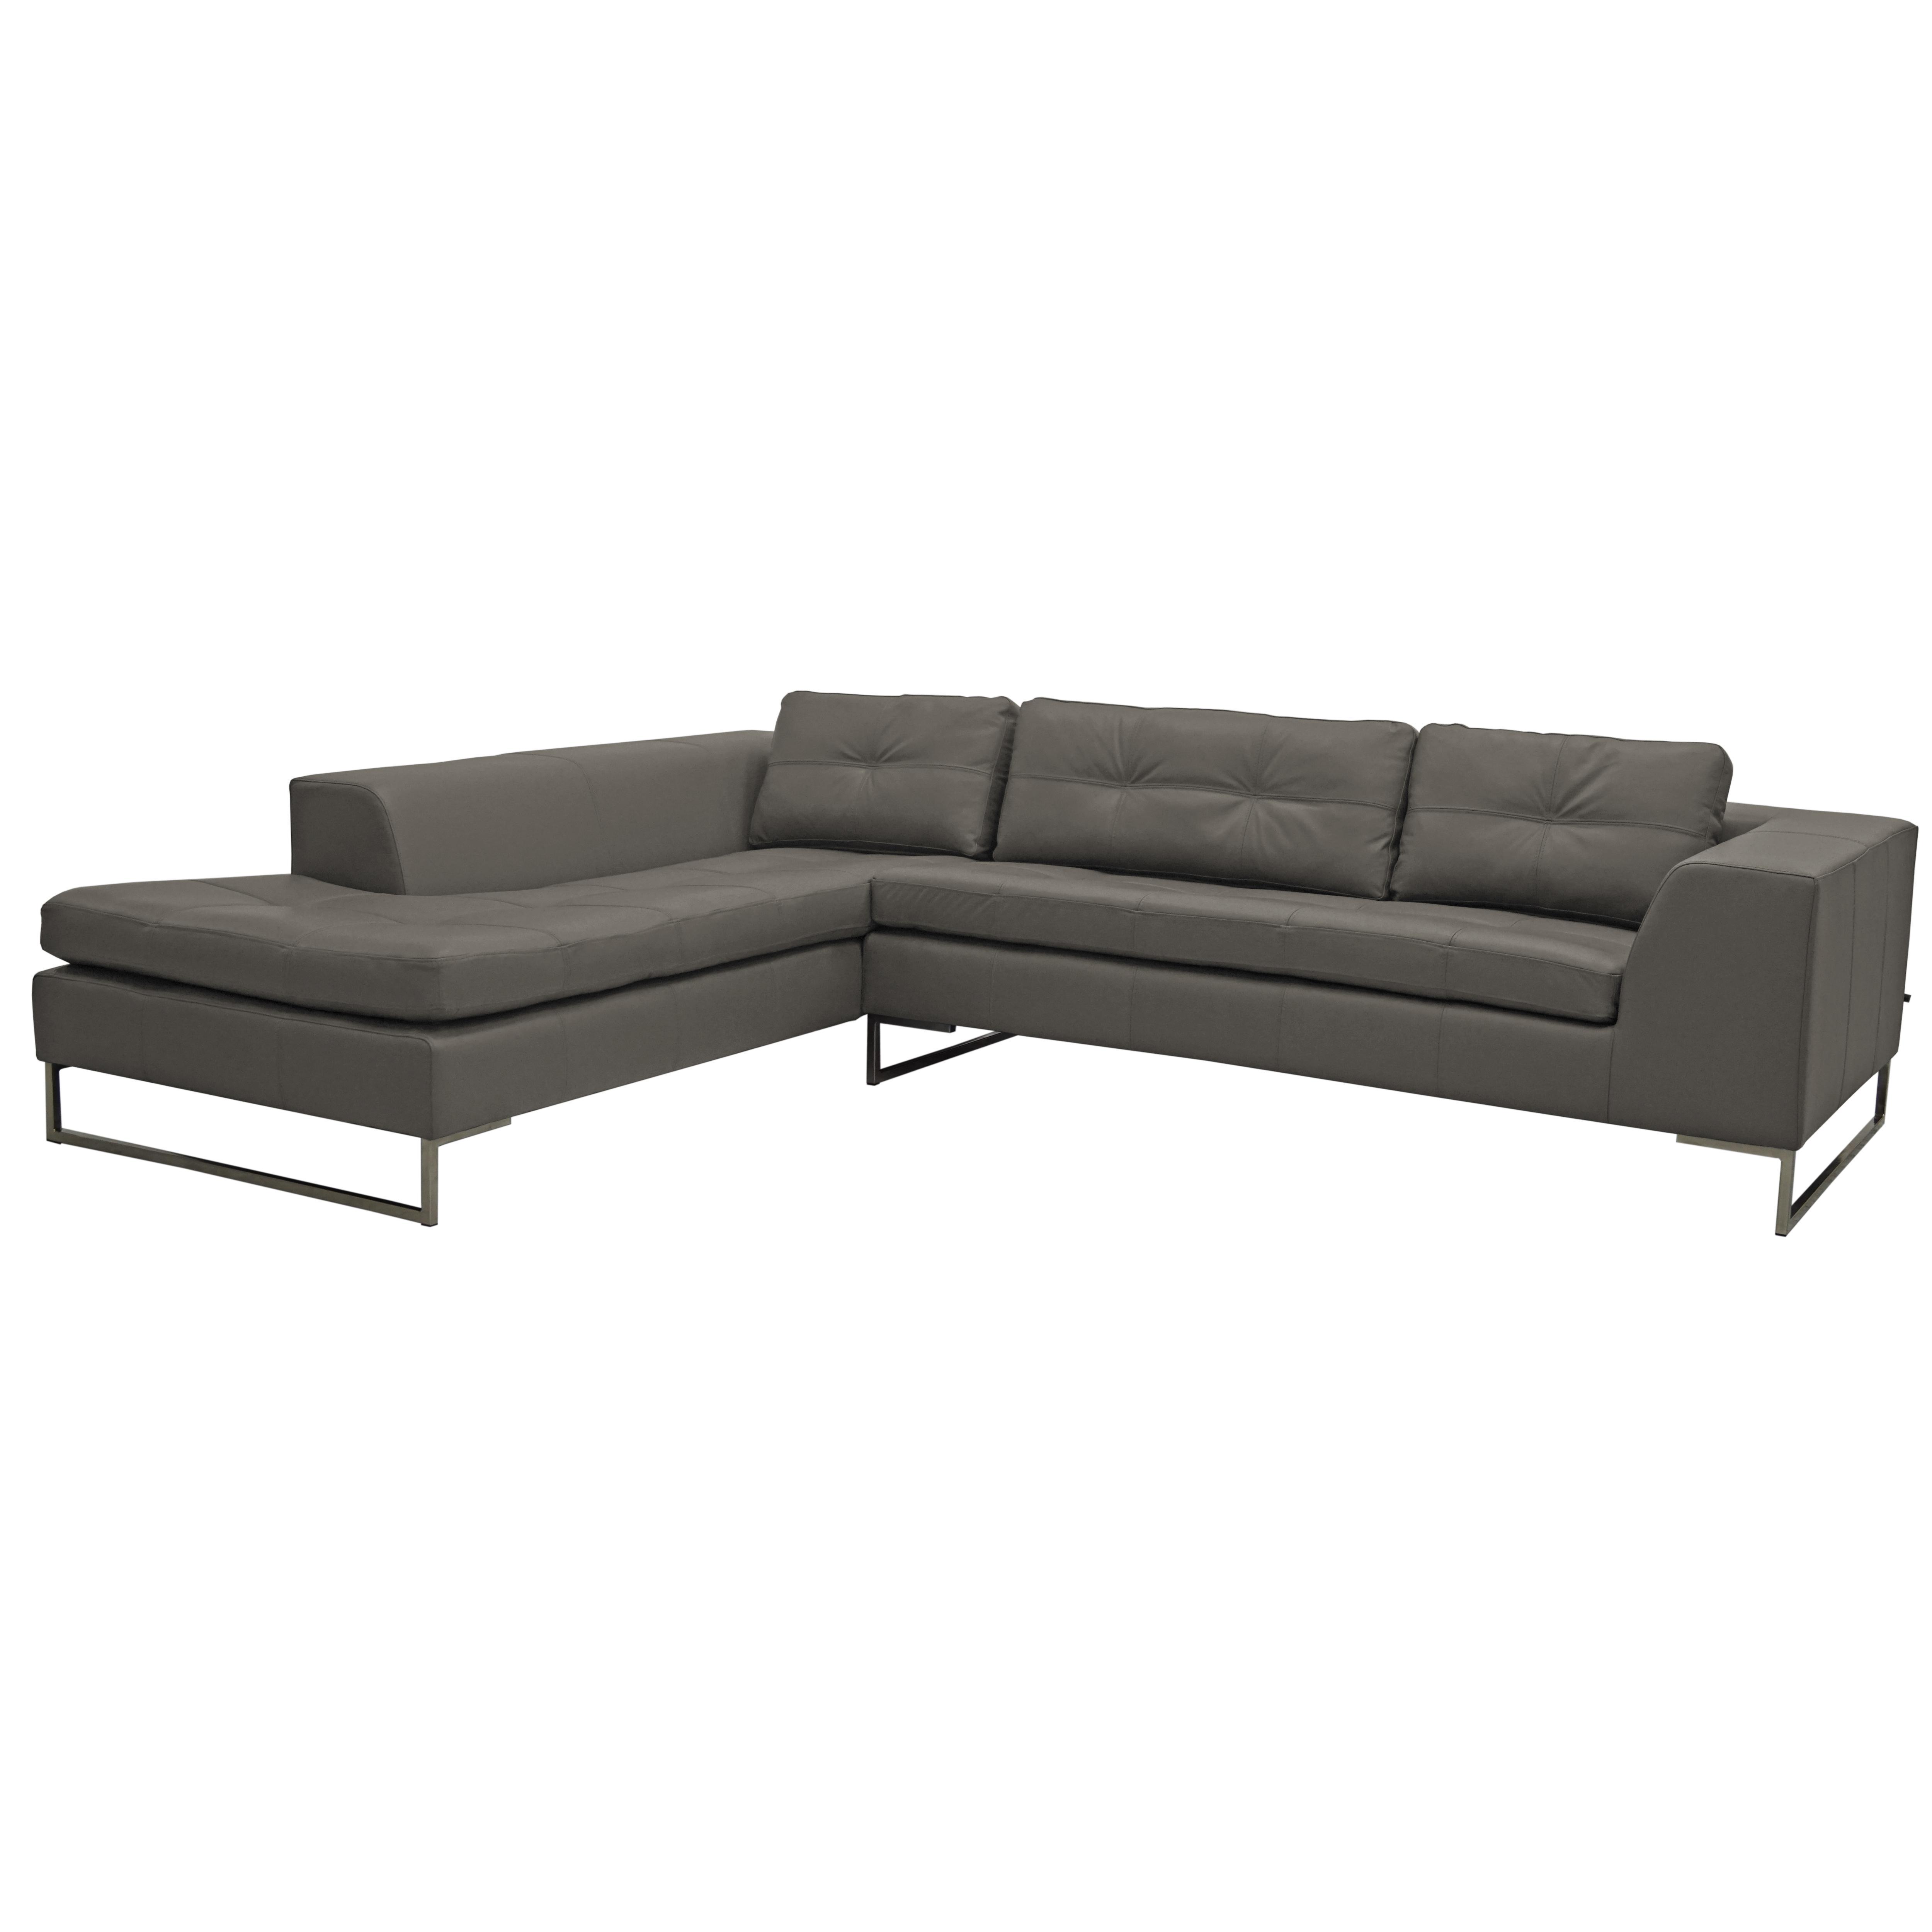 Toleda right hand facing arm corner sofa mollis leather light grey